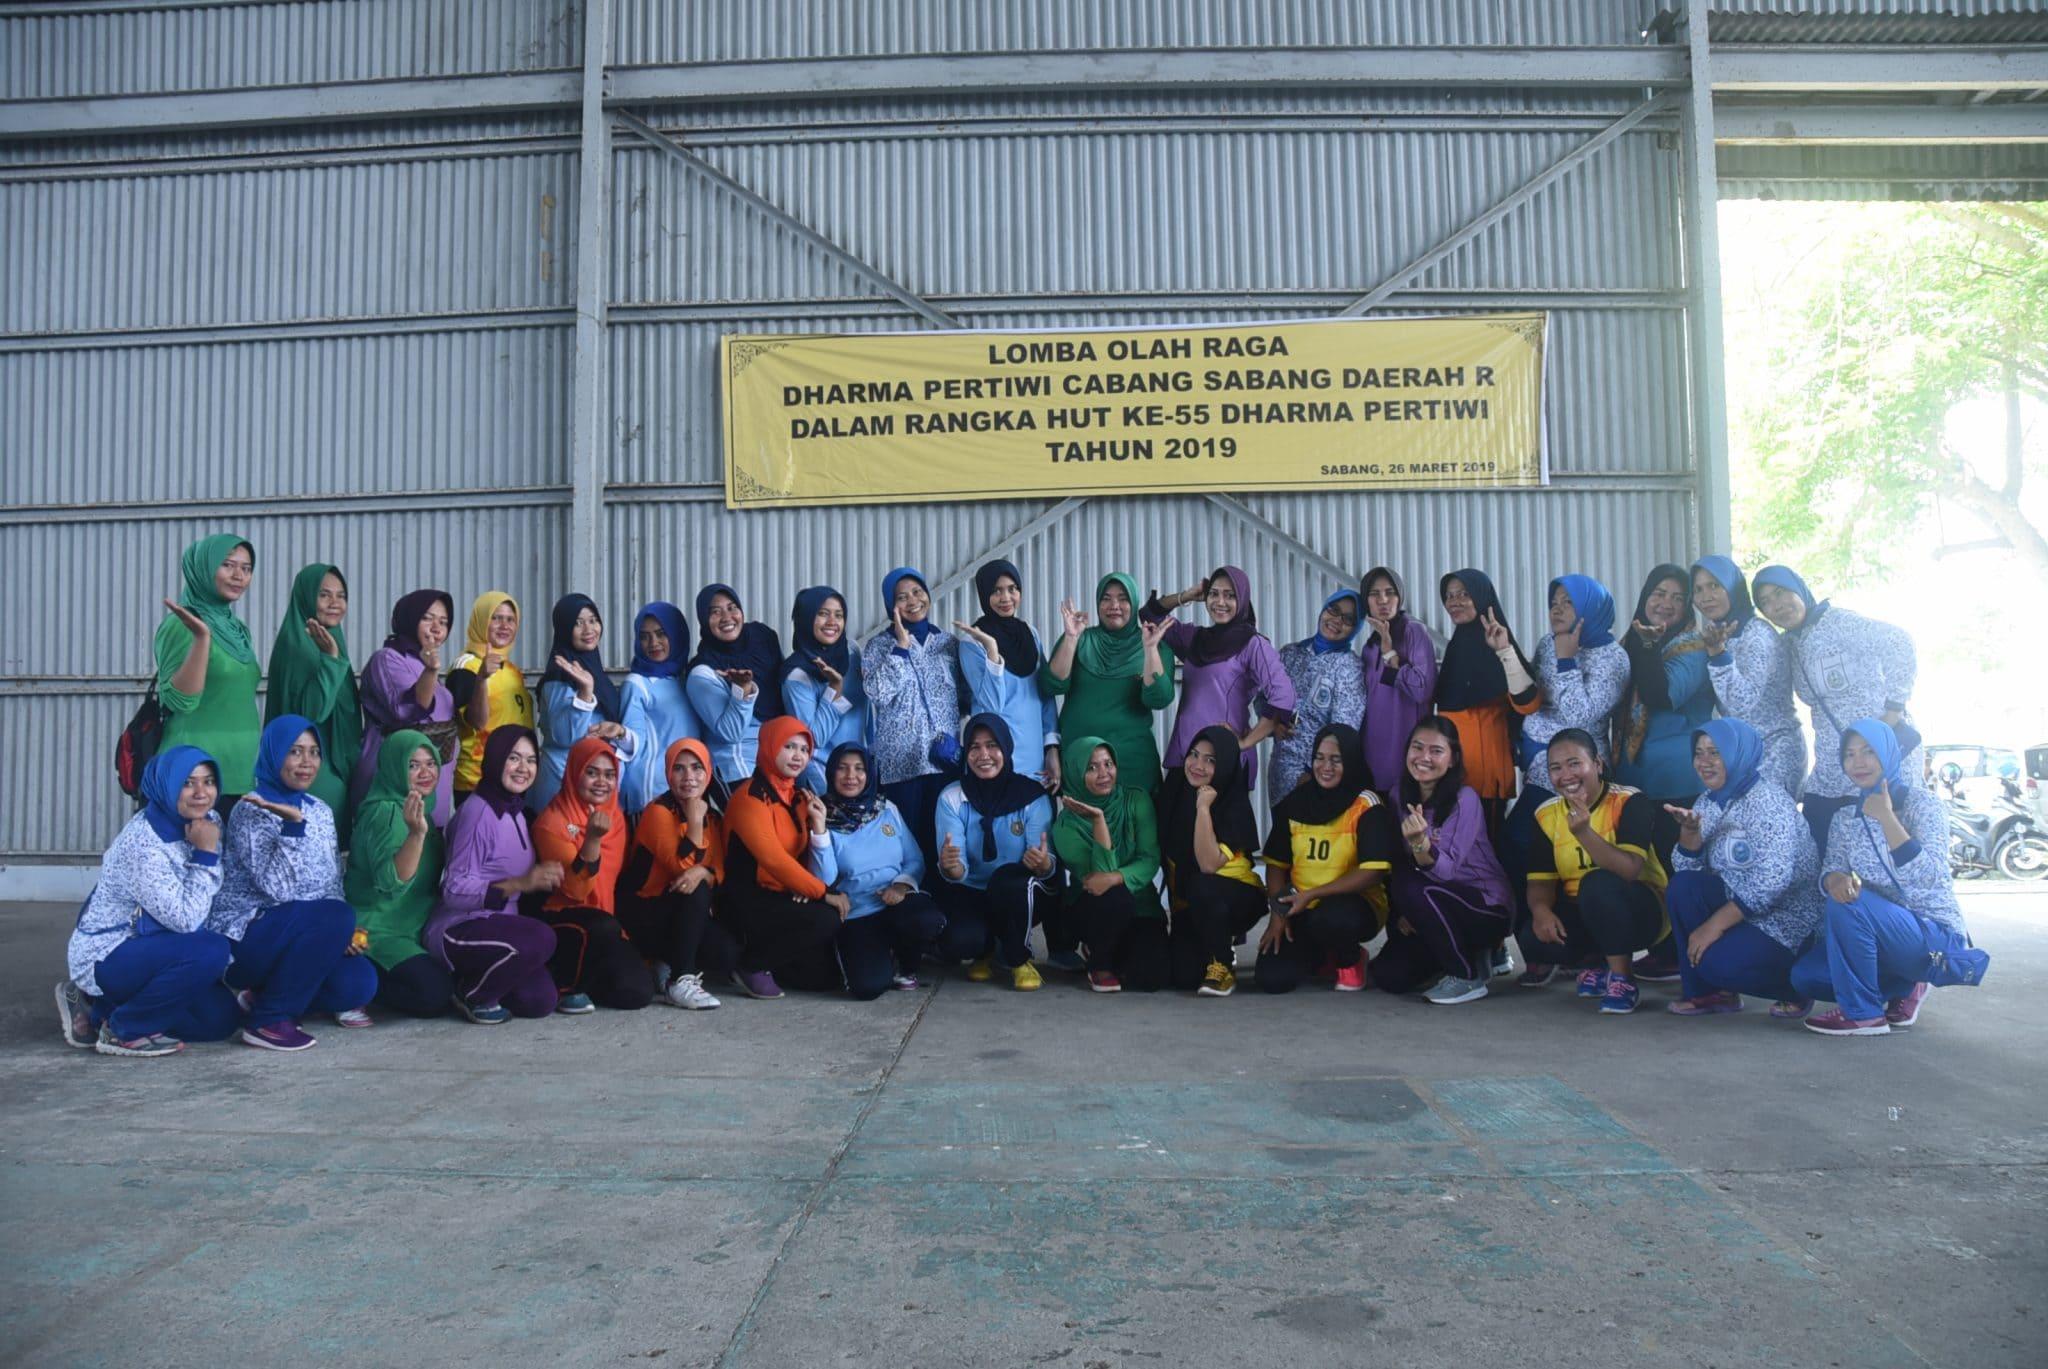 PIA Ardhya Garini Cabang IV/DI Lanud Maimun Saleh Olahraga Bersama dengan Dharma Pertiwi Daerah R